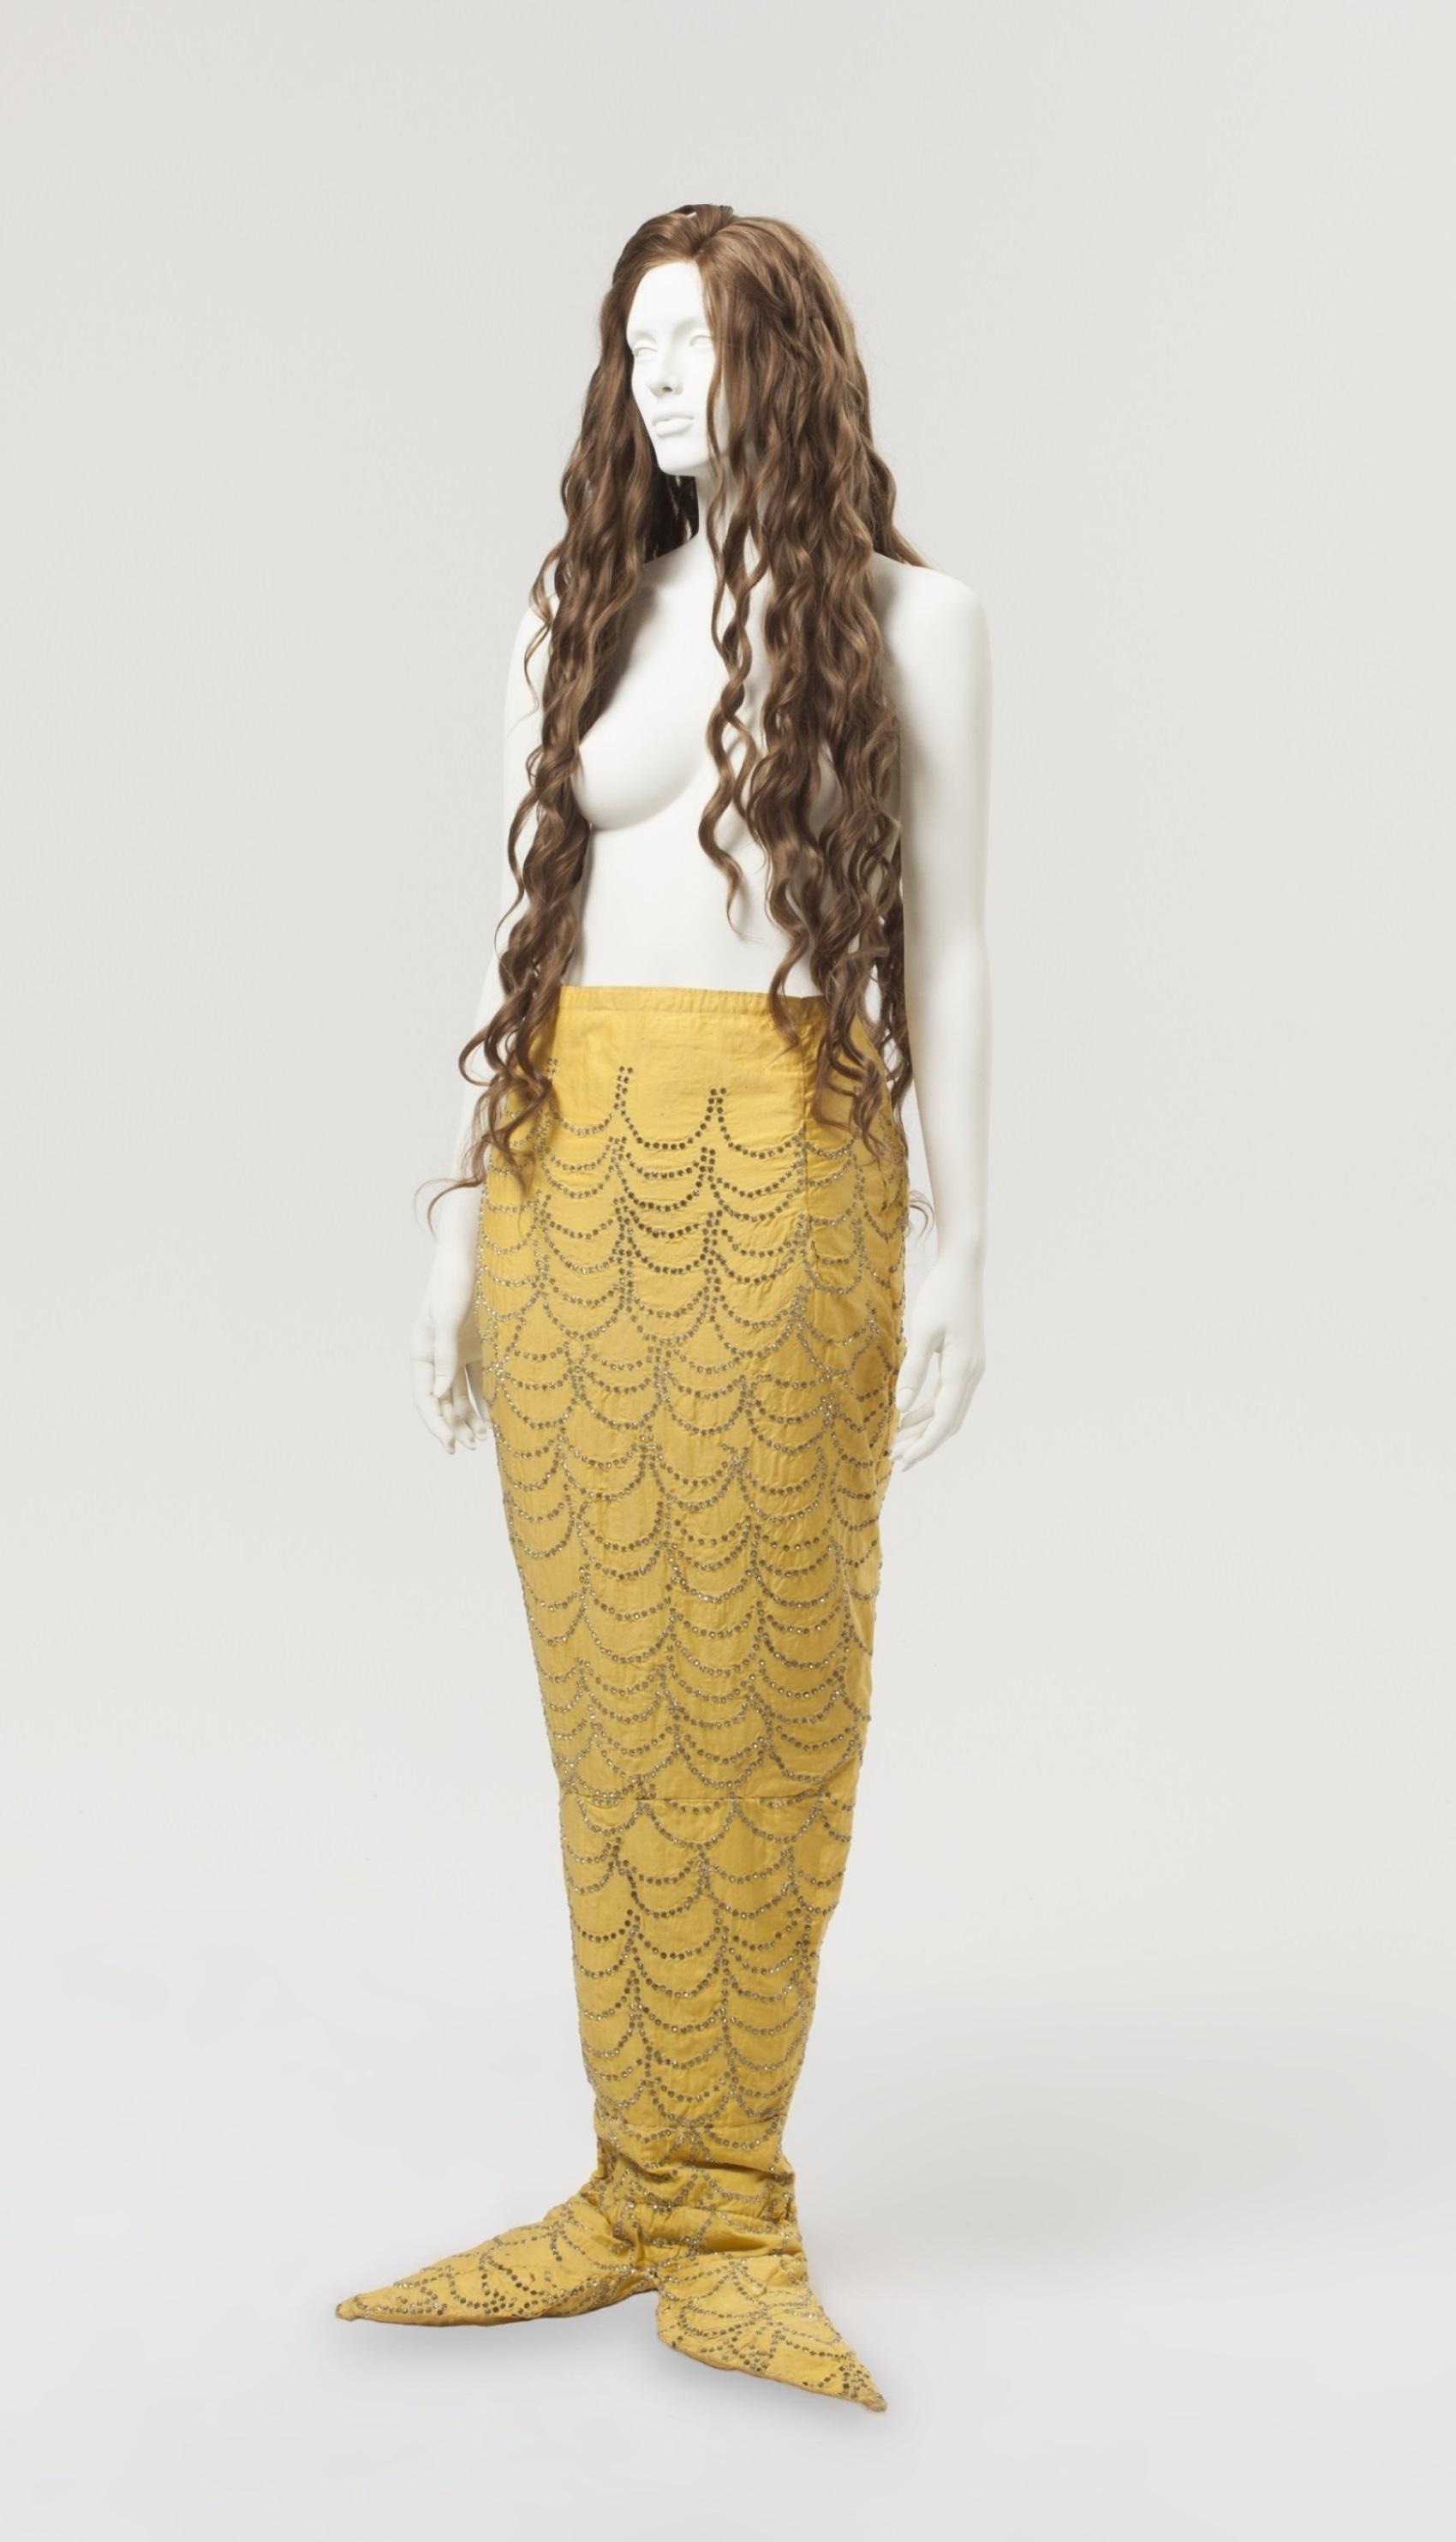 Kellerman's mermaid costume